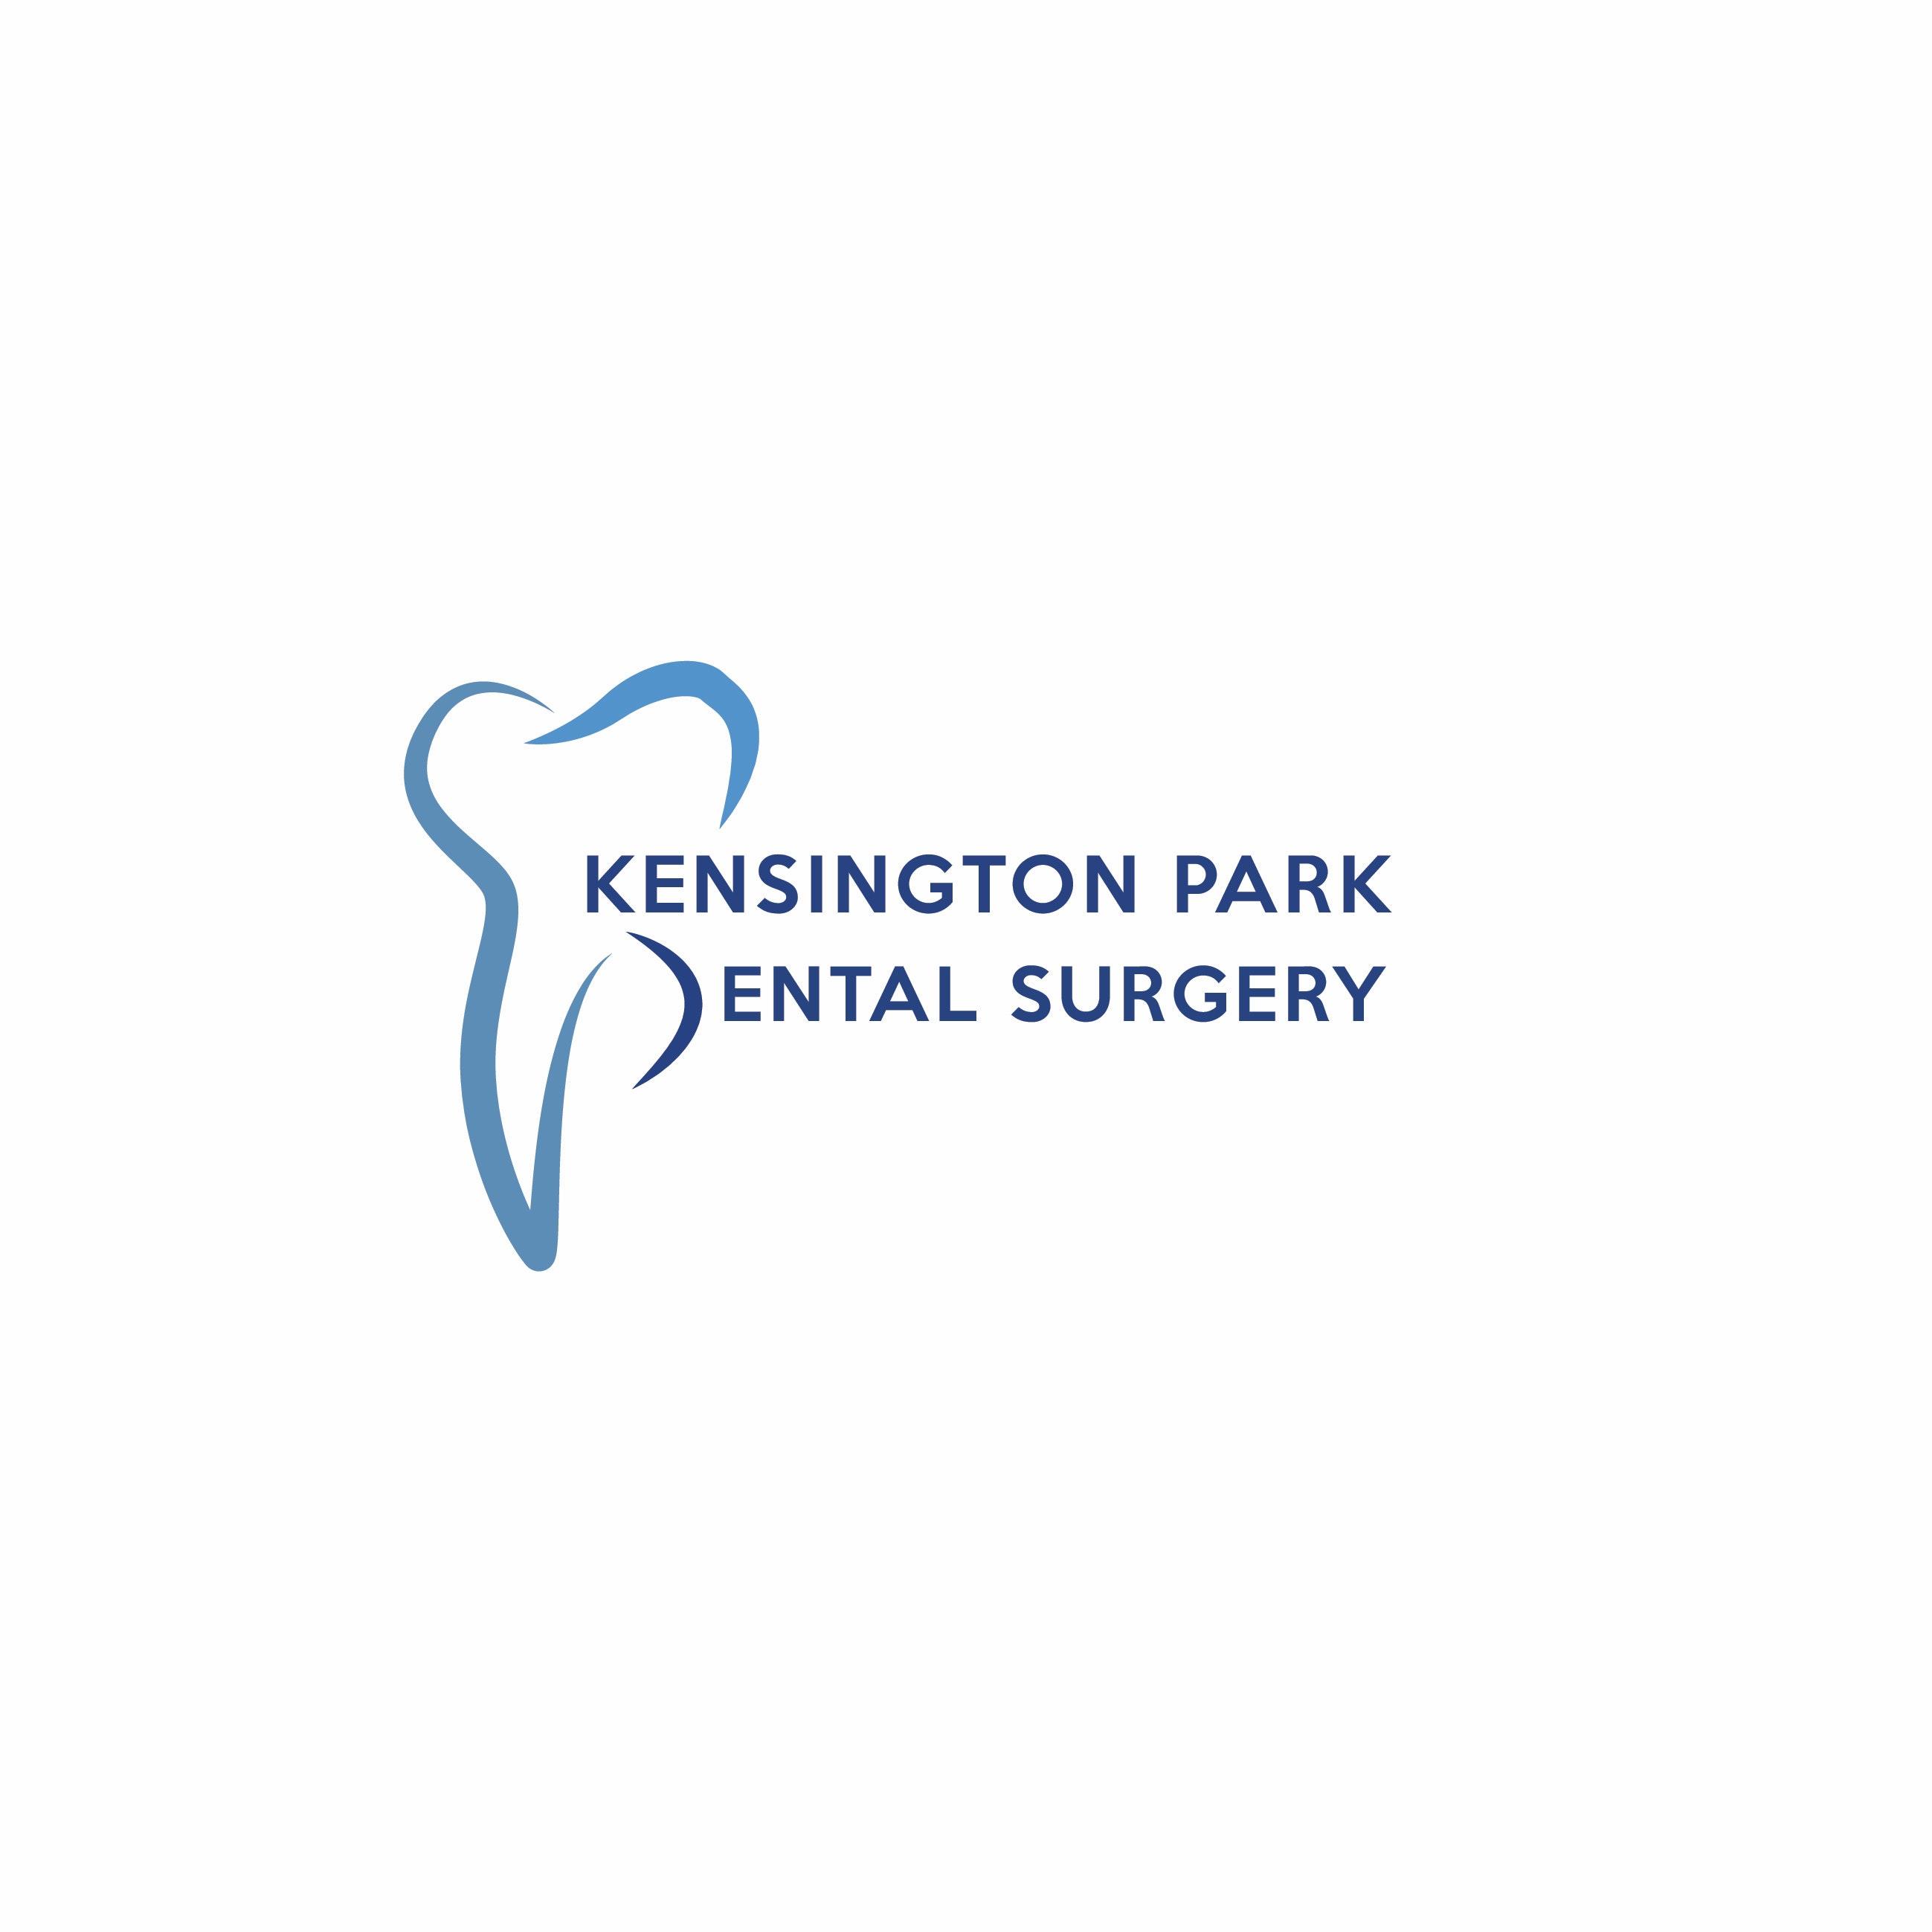 Kensington Park Dental Surgery